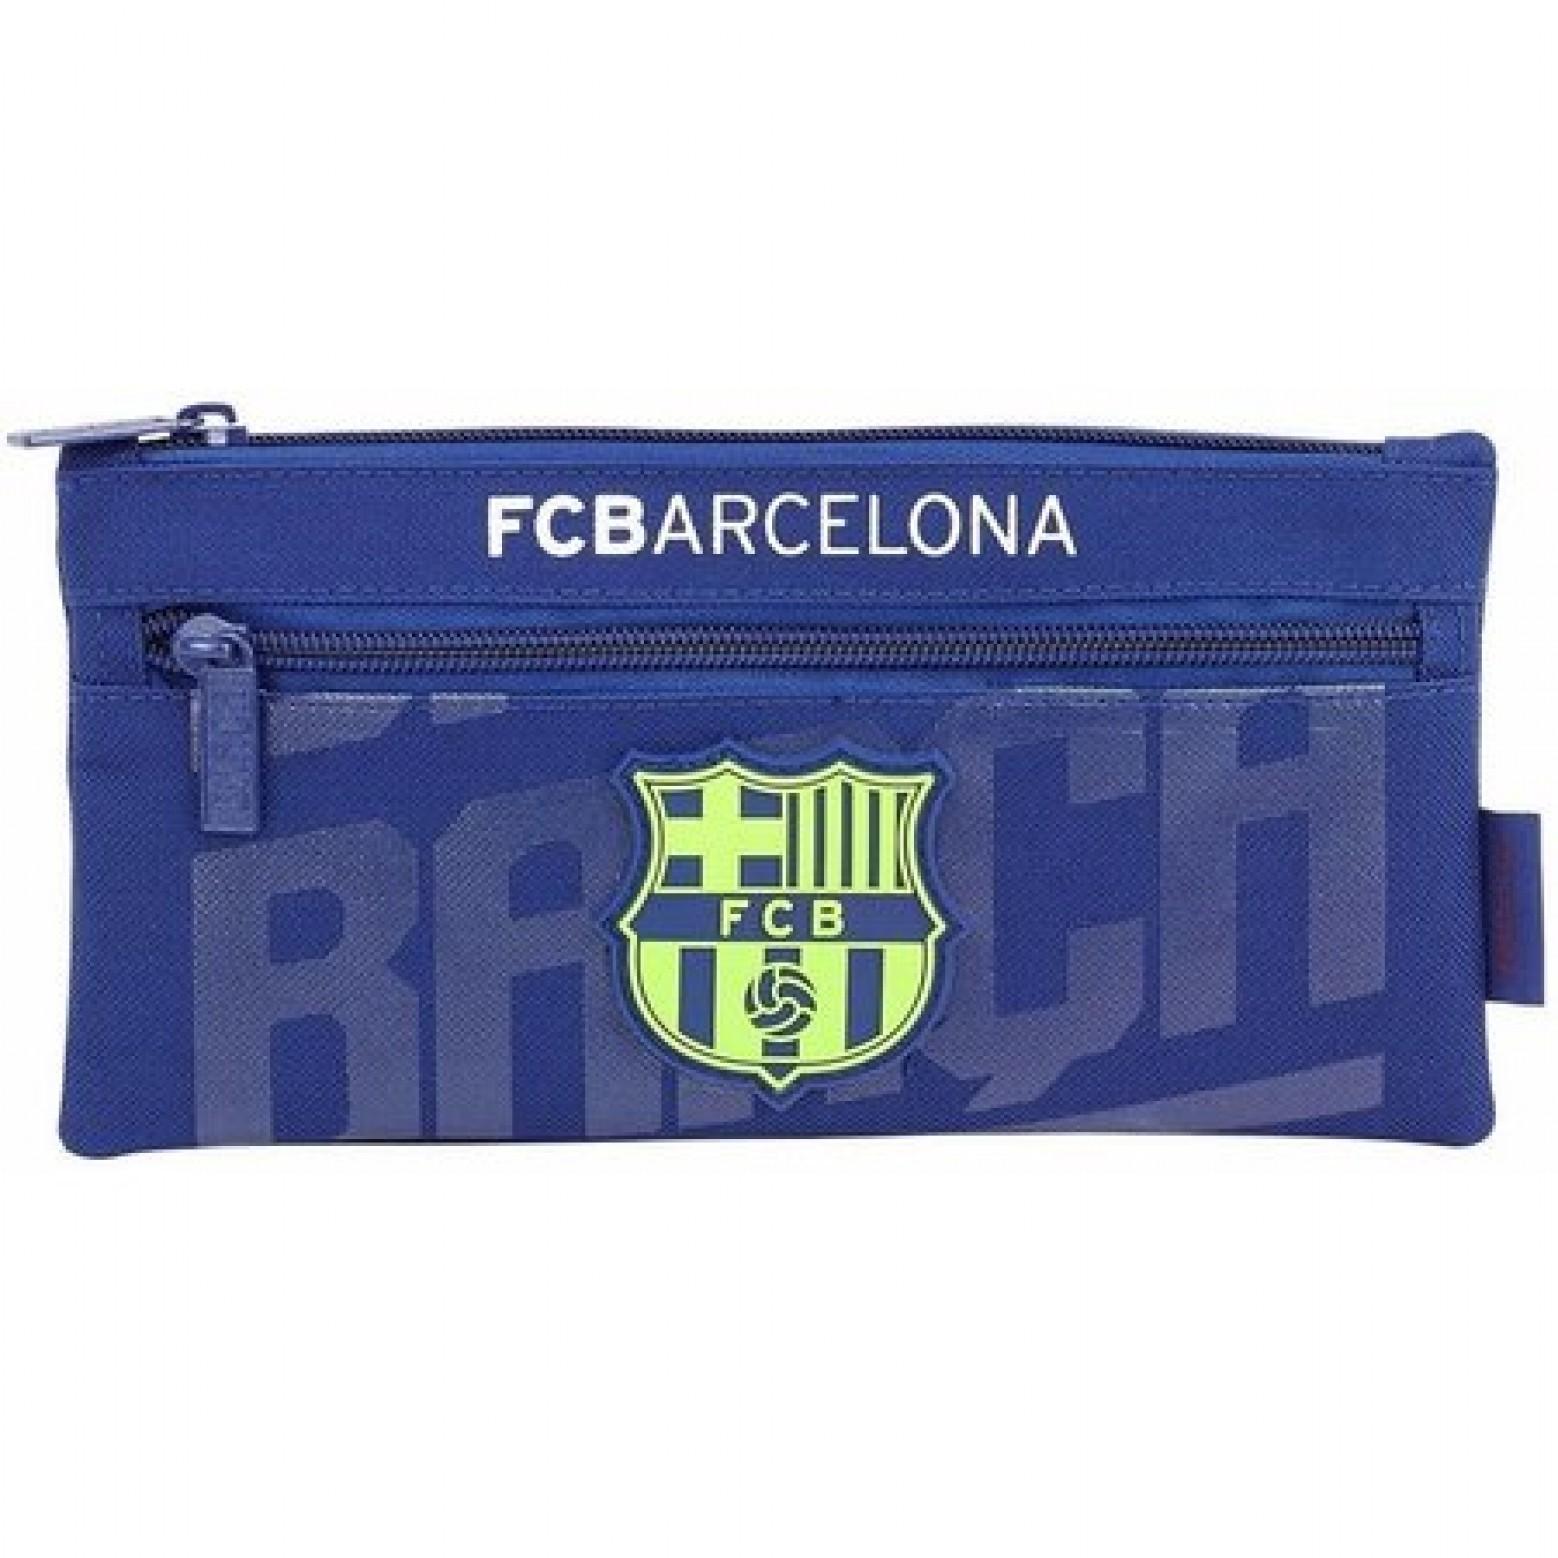 F.C Barcelona etui